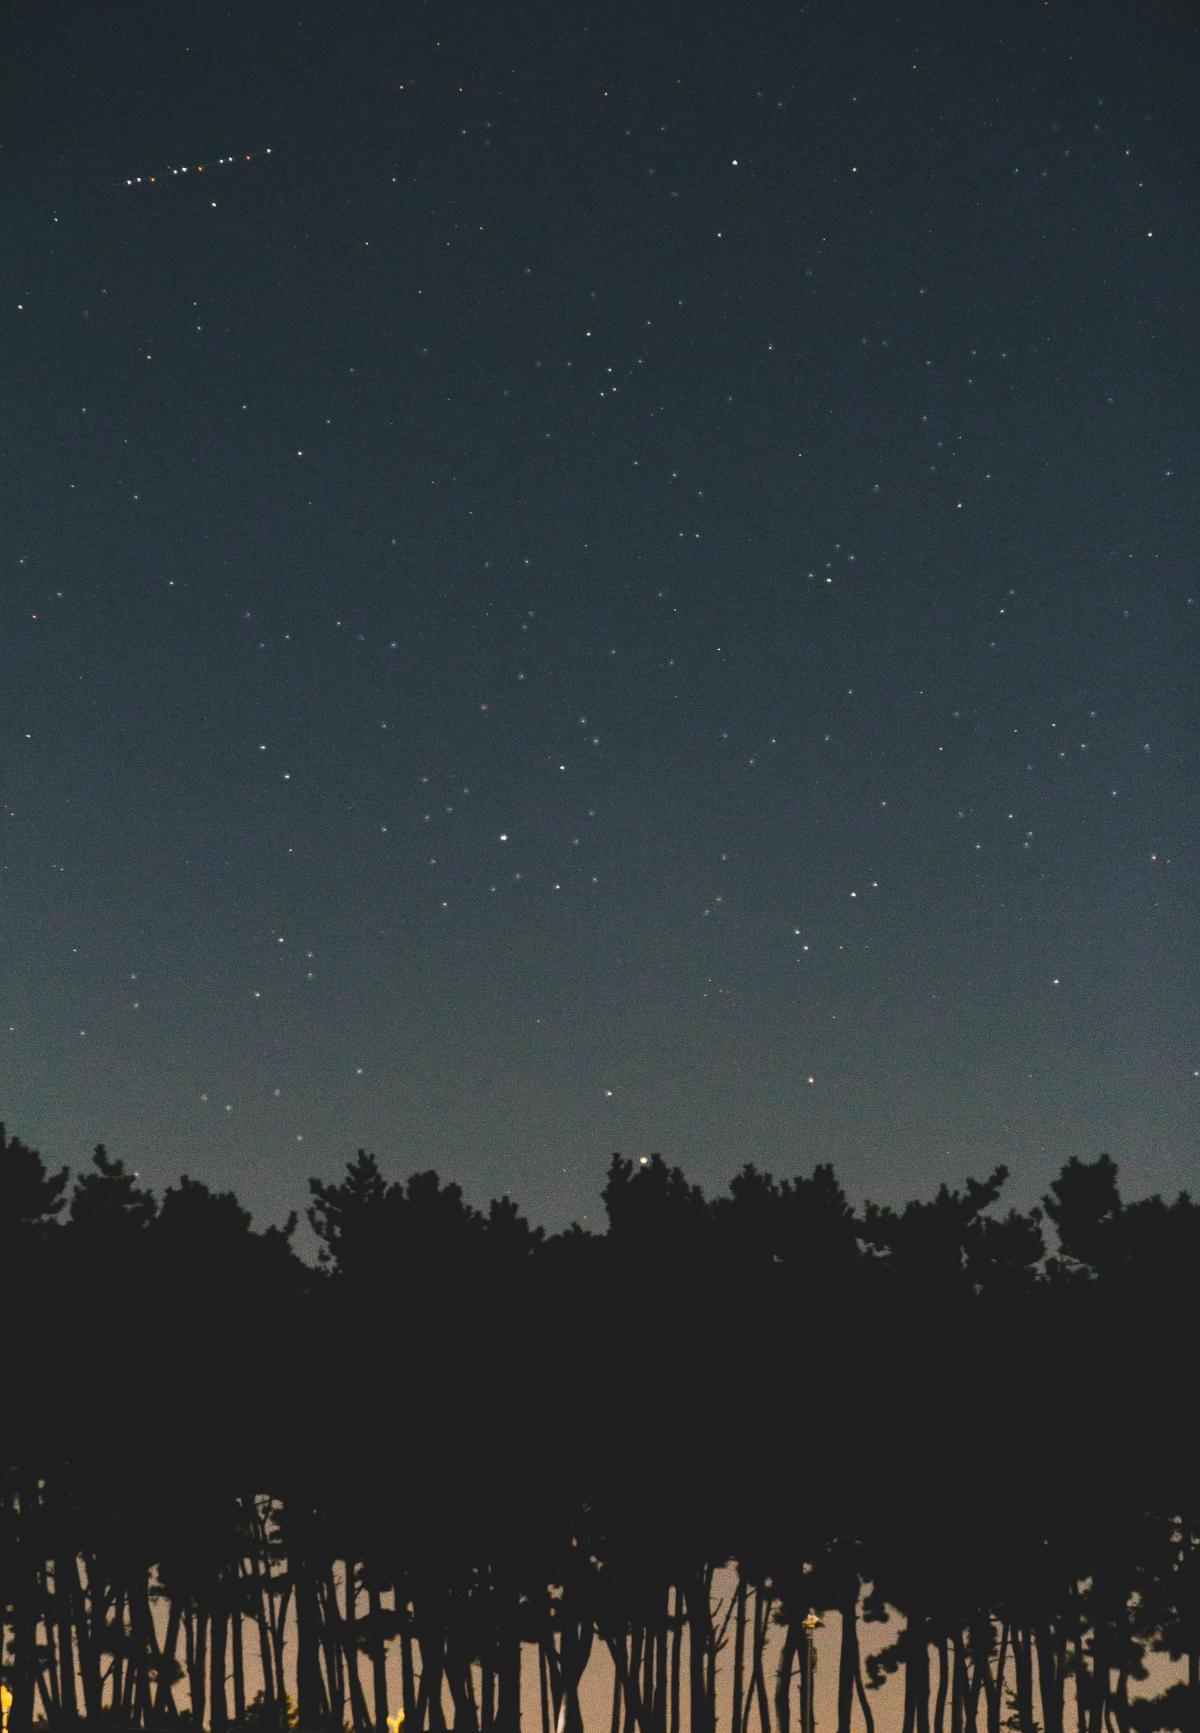 Star Celestial body Night